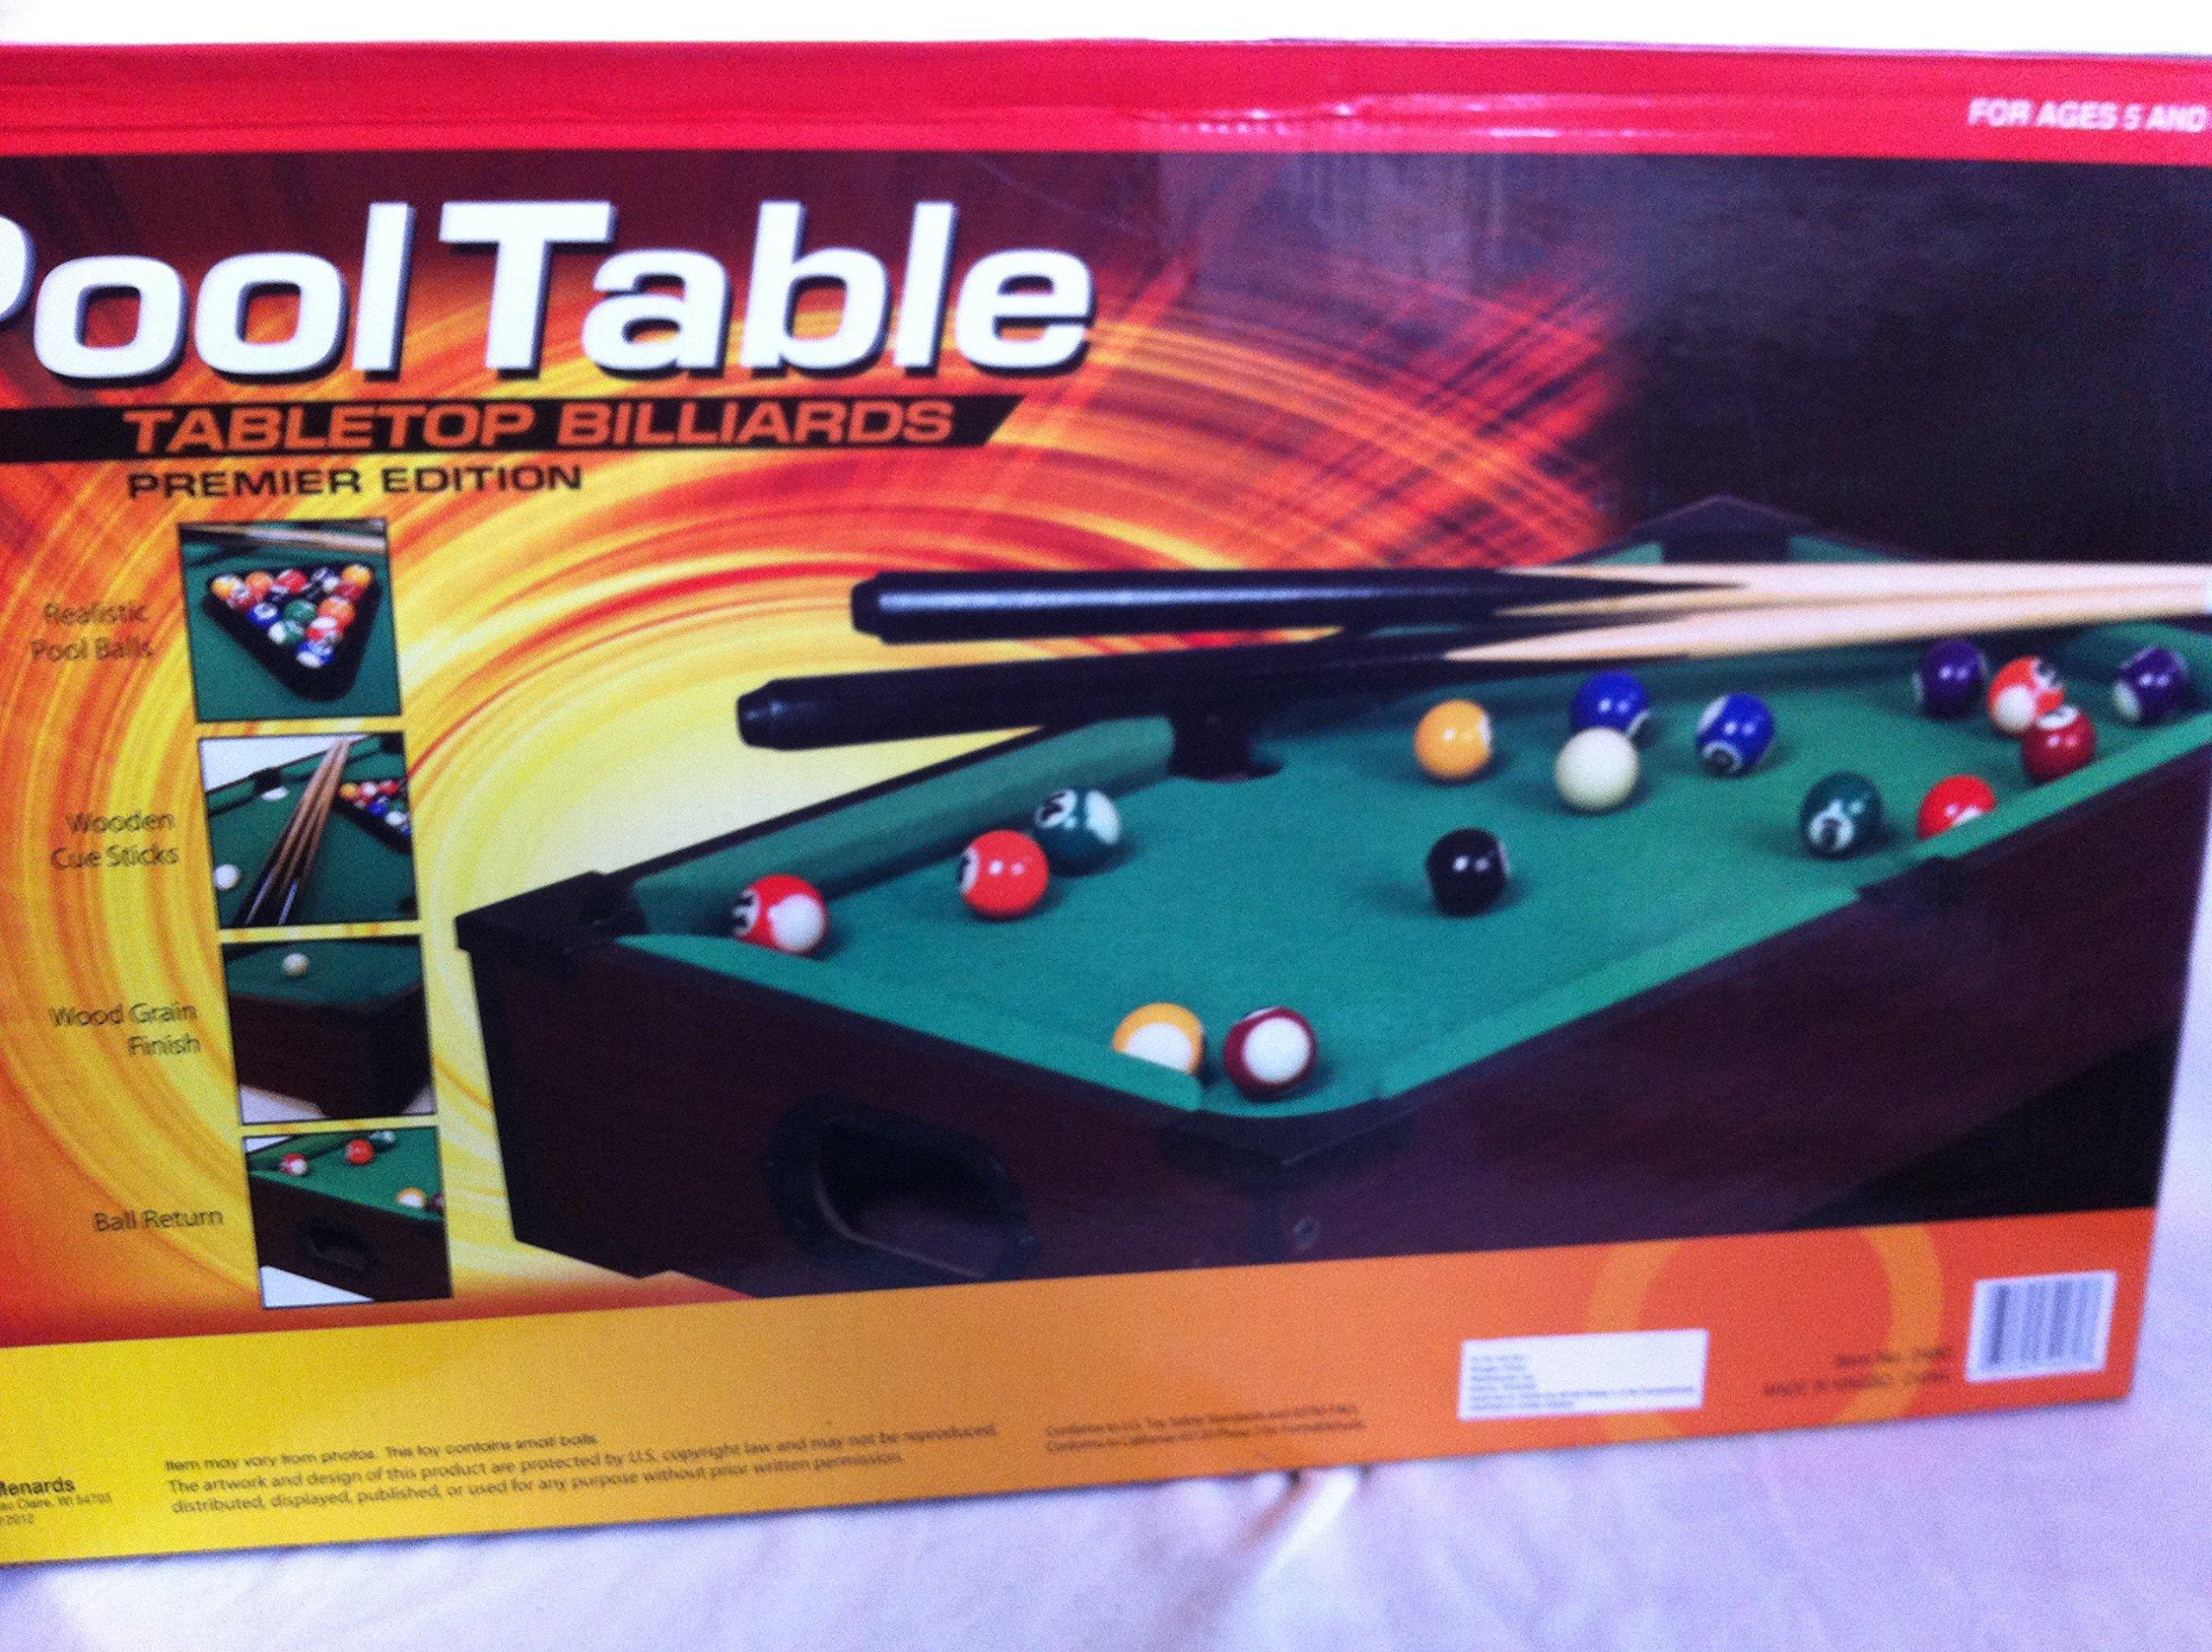 POOL TABLE TABLETOP BILLIARDS PREMIER EDITION